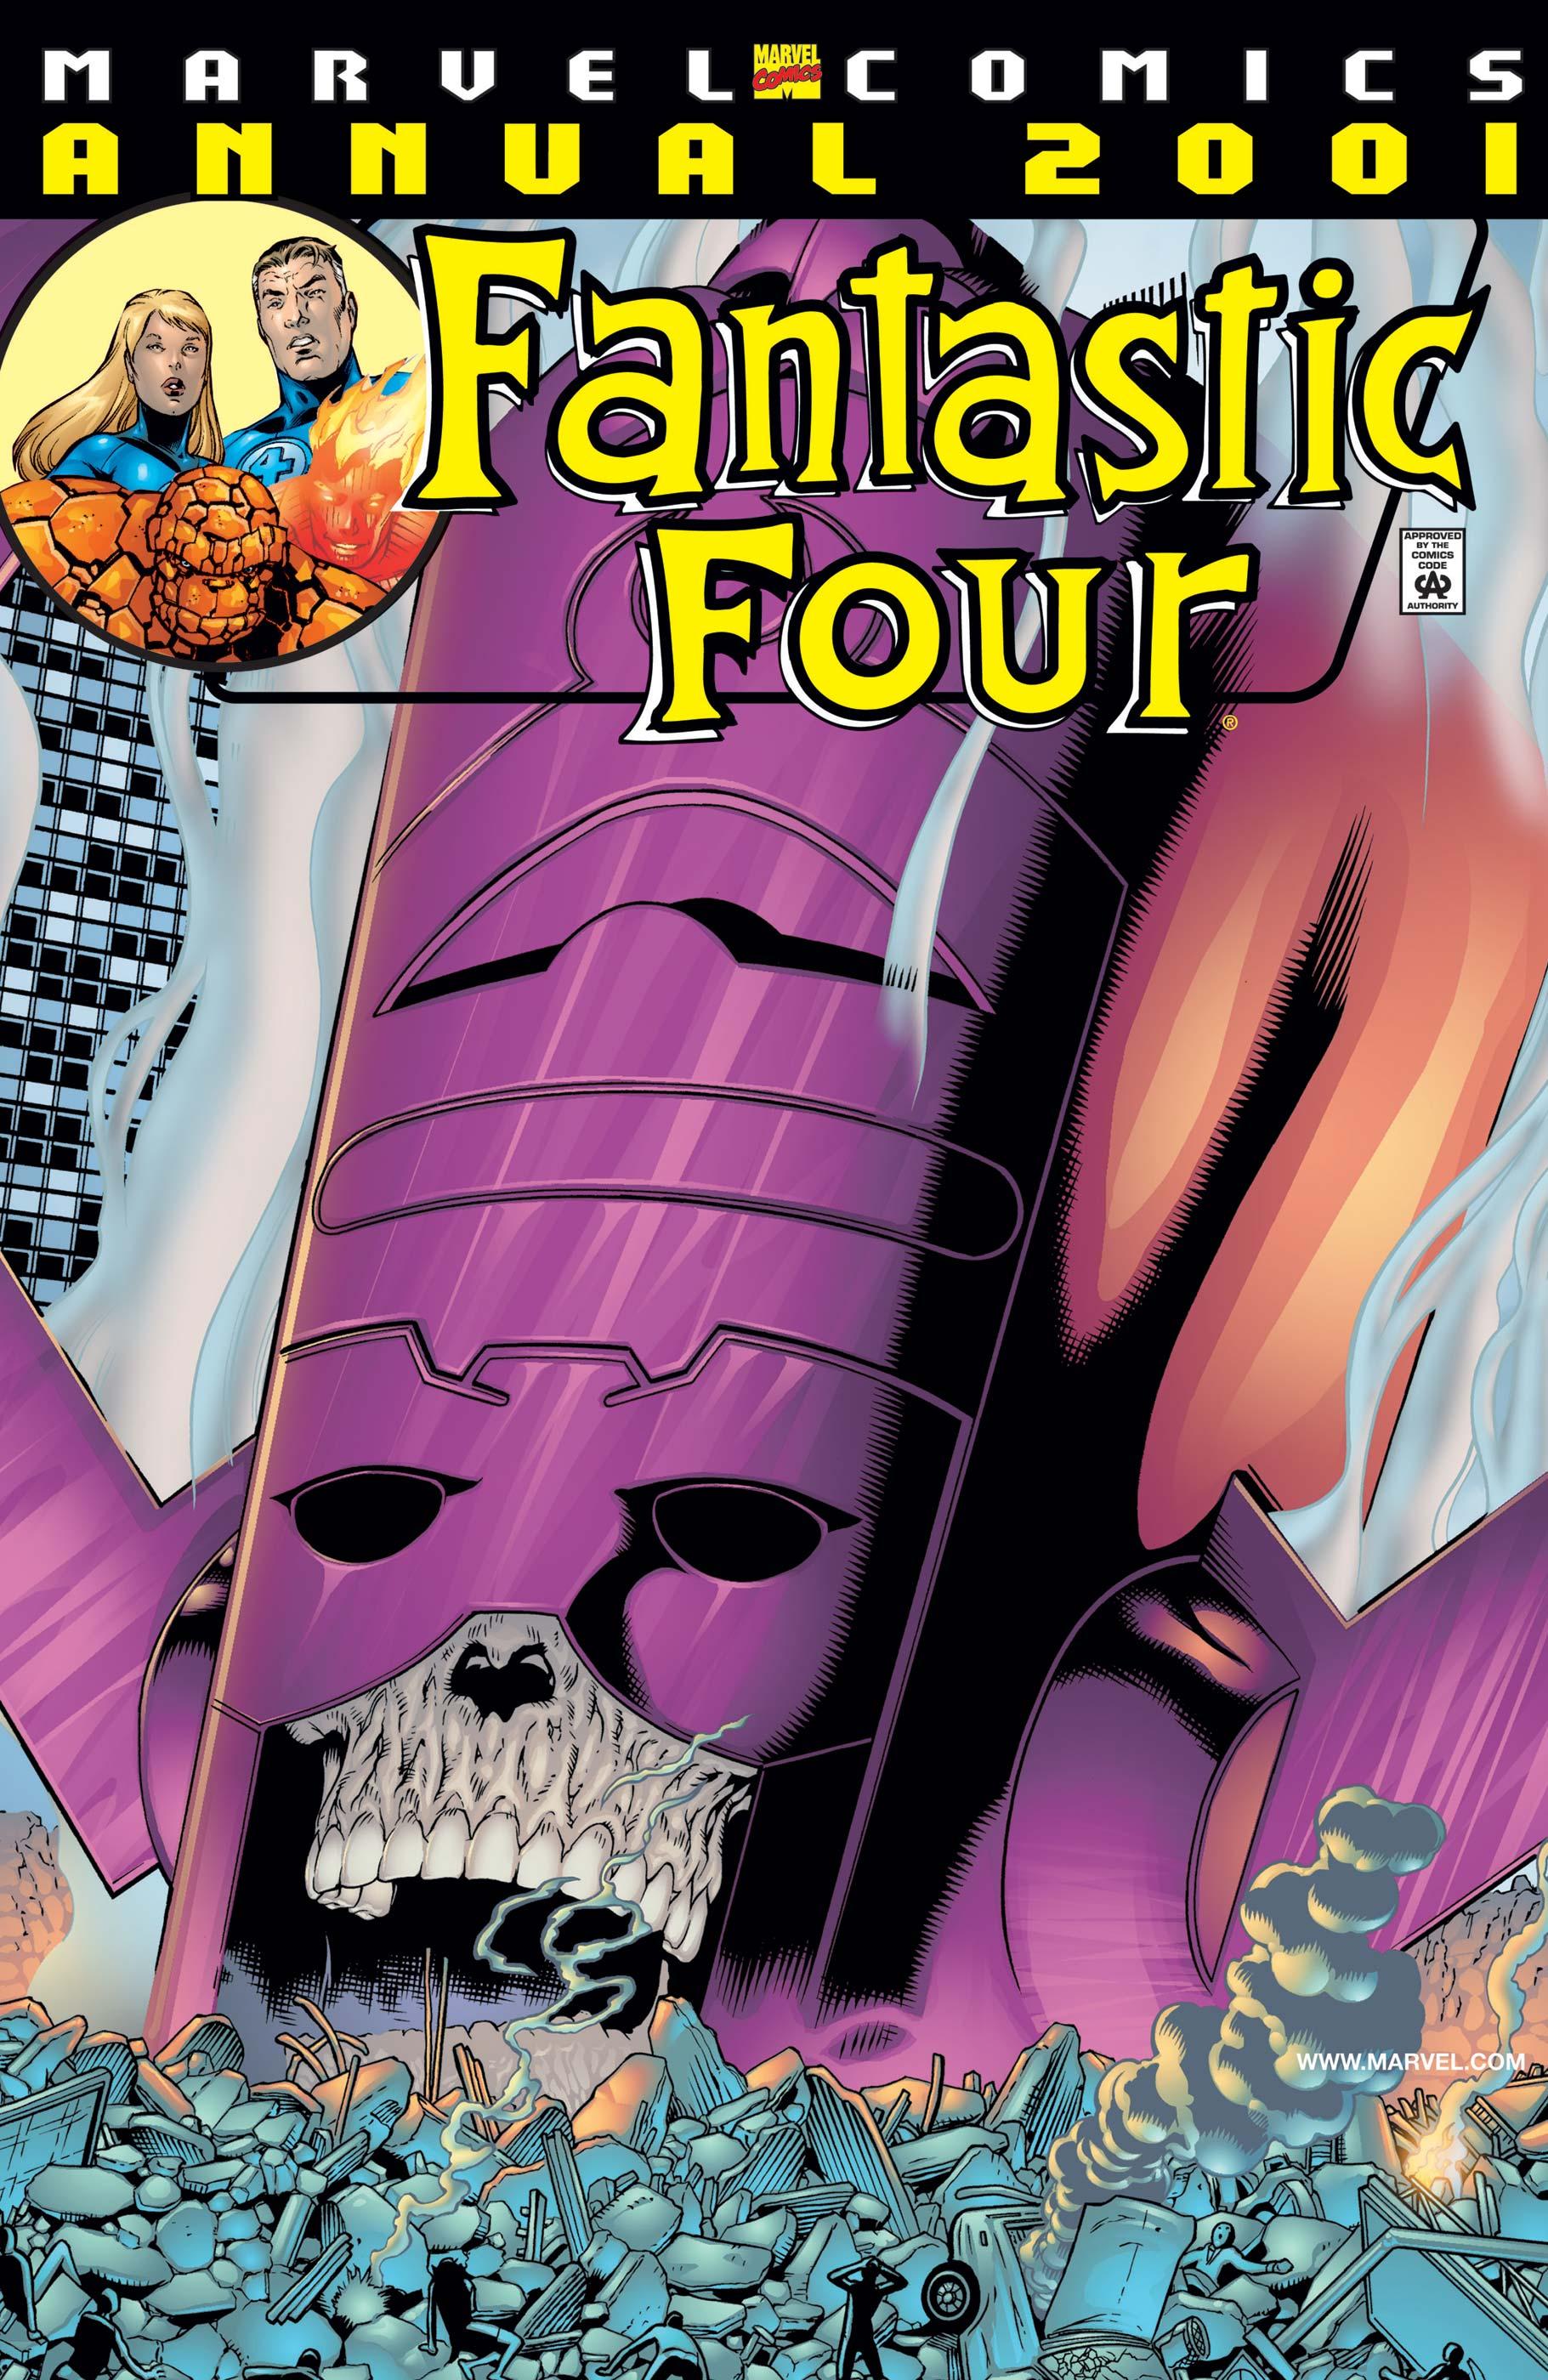 Fantastic Four Annual (2001) #1